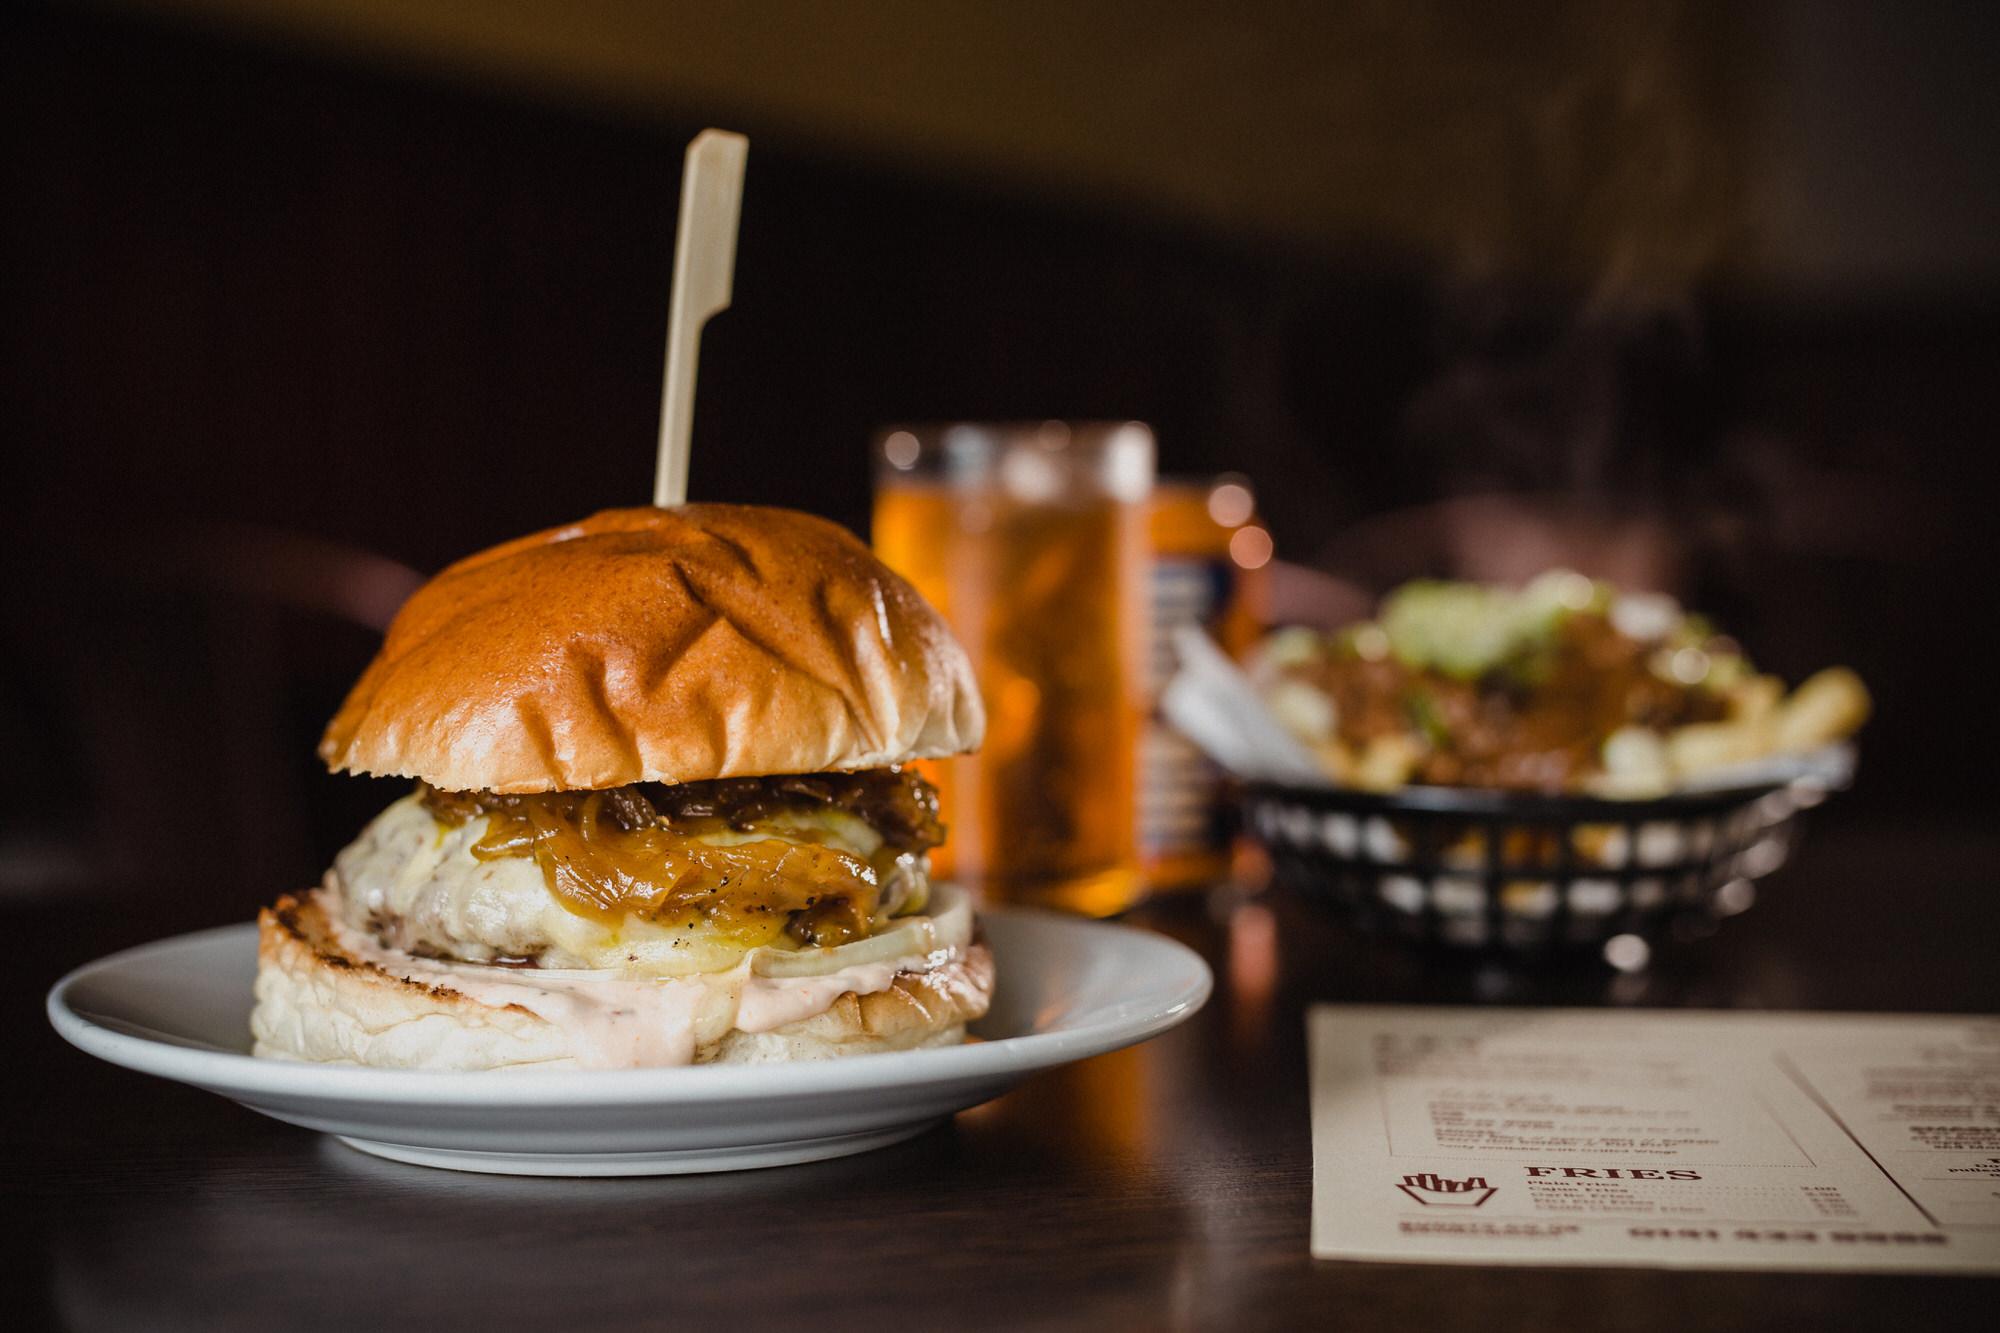 160818-Buddys-BBQ-Burgers-24.jpg